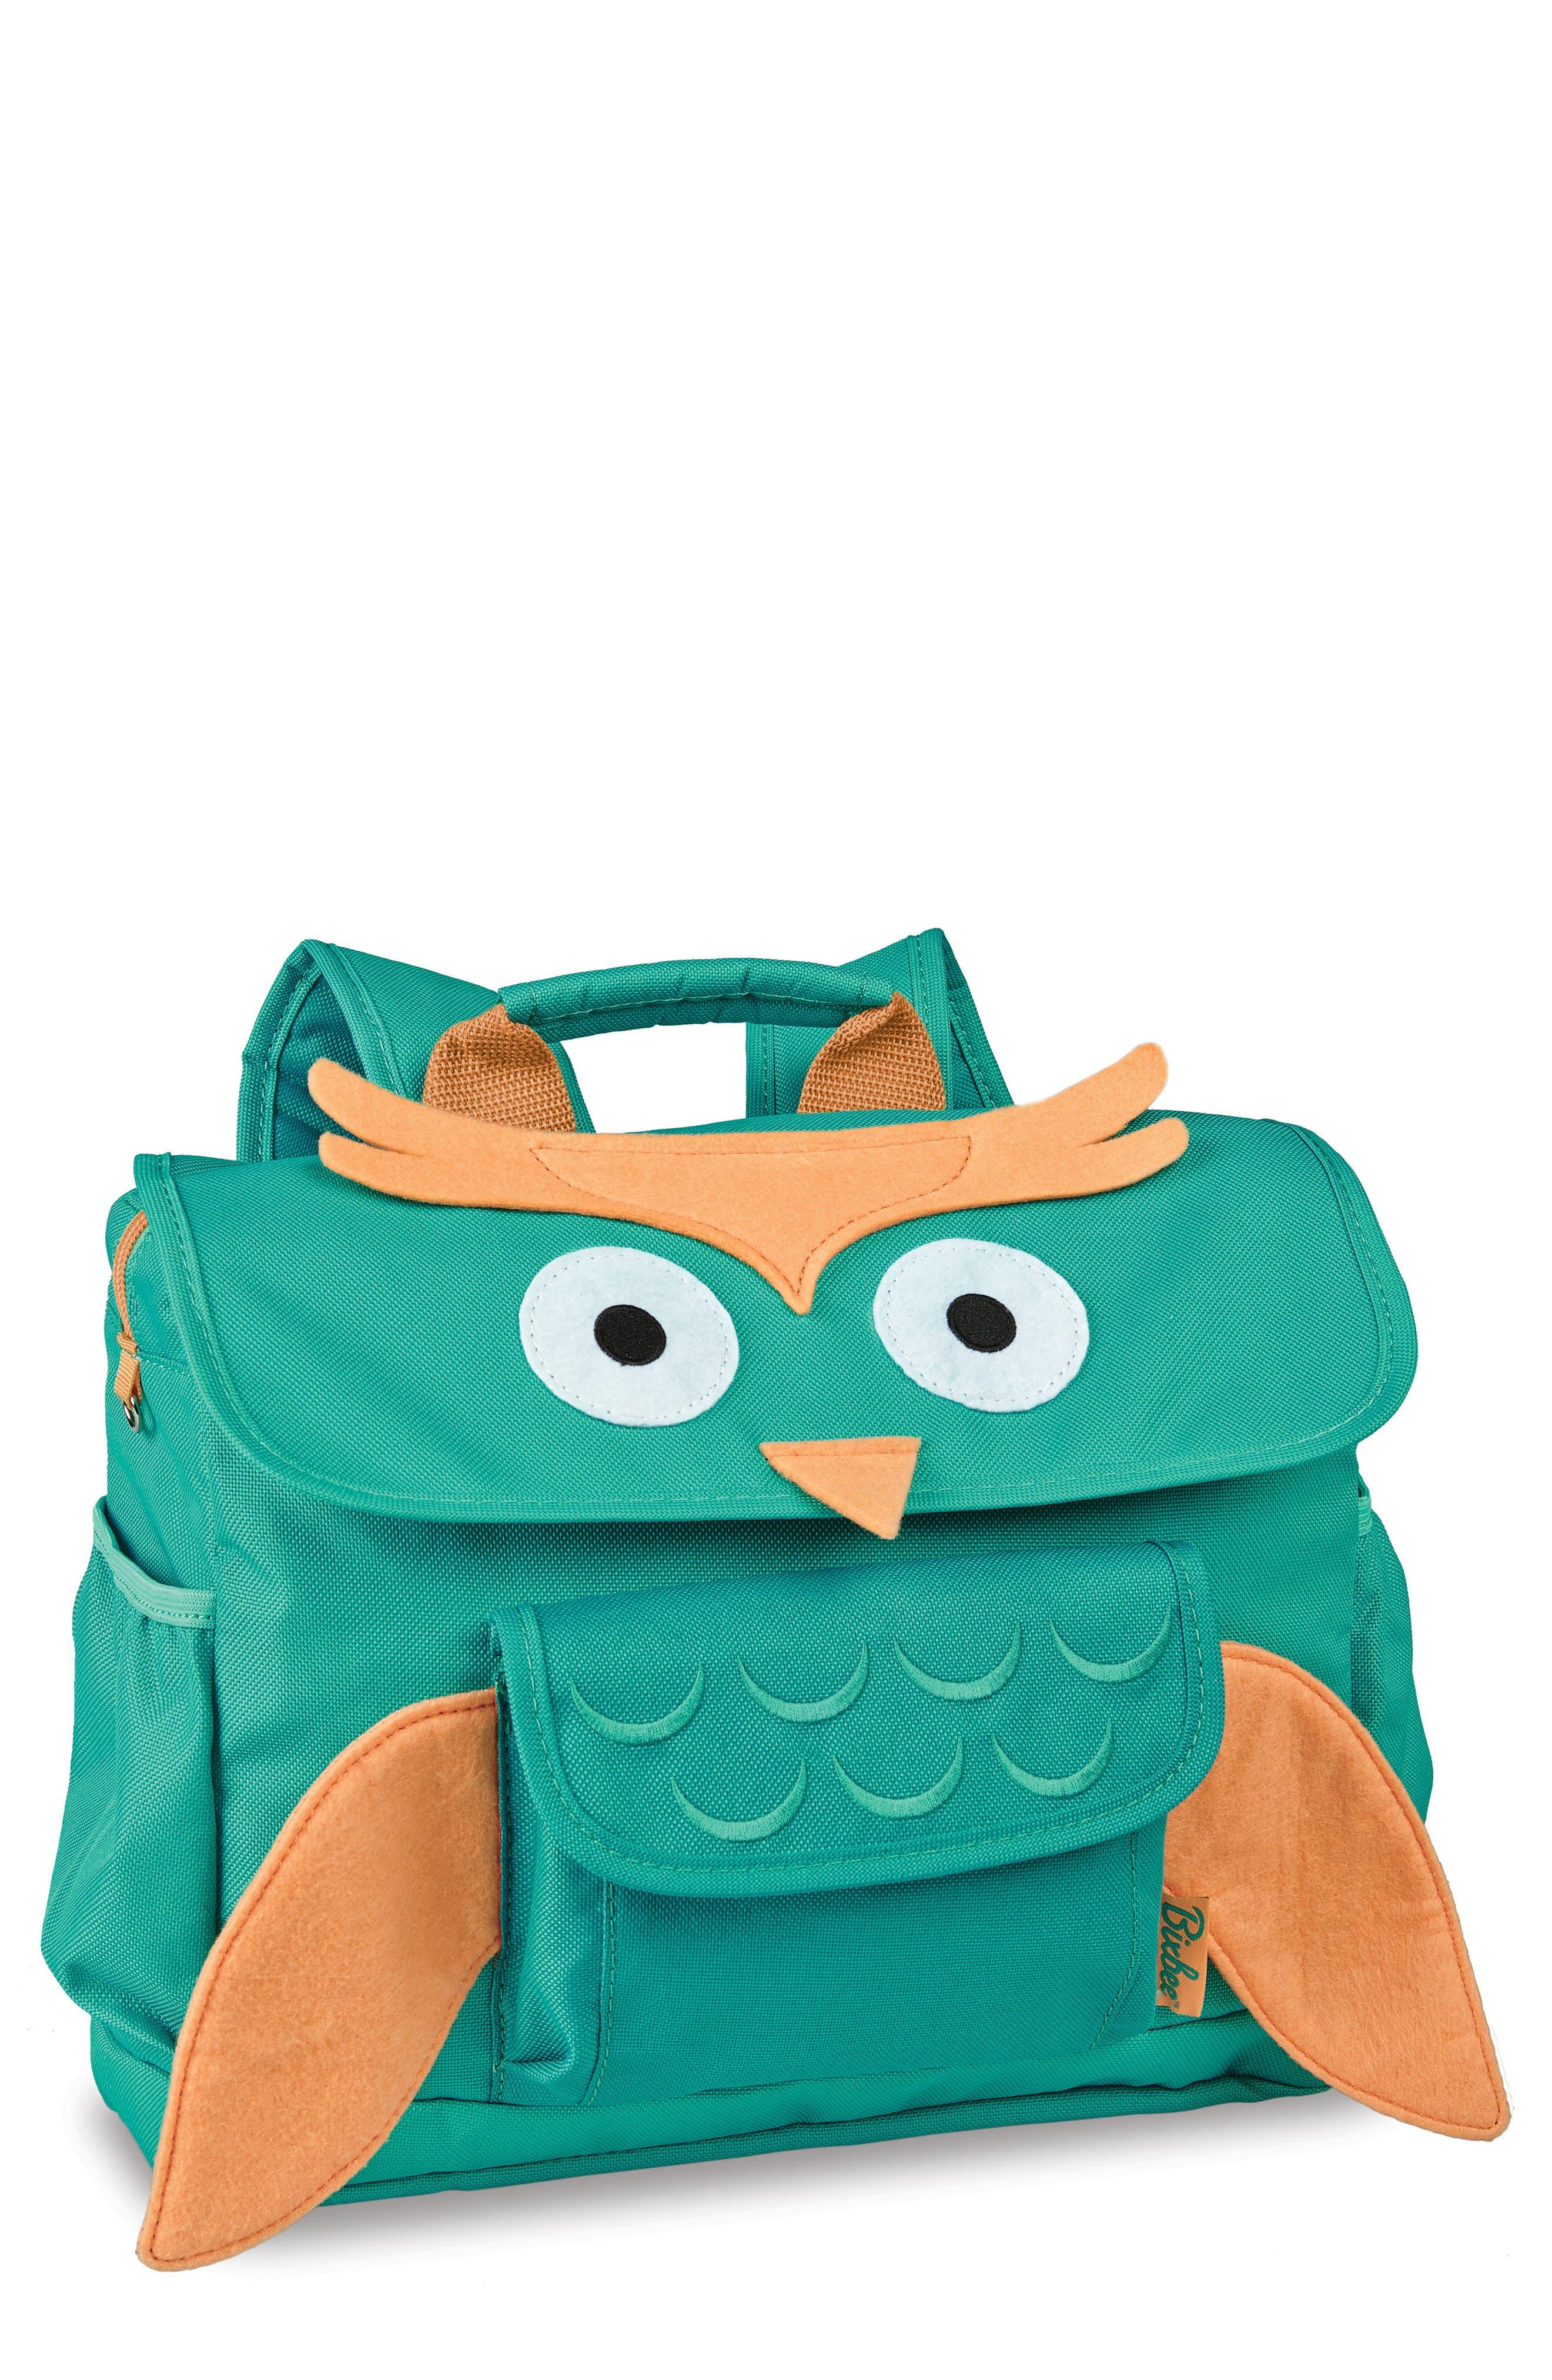 Bixbee Animal Pack – Owl Backpack (Kids)